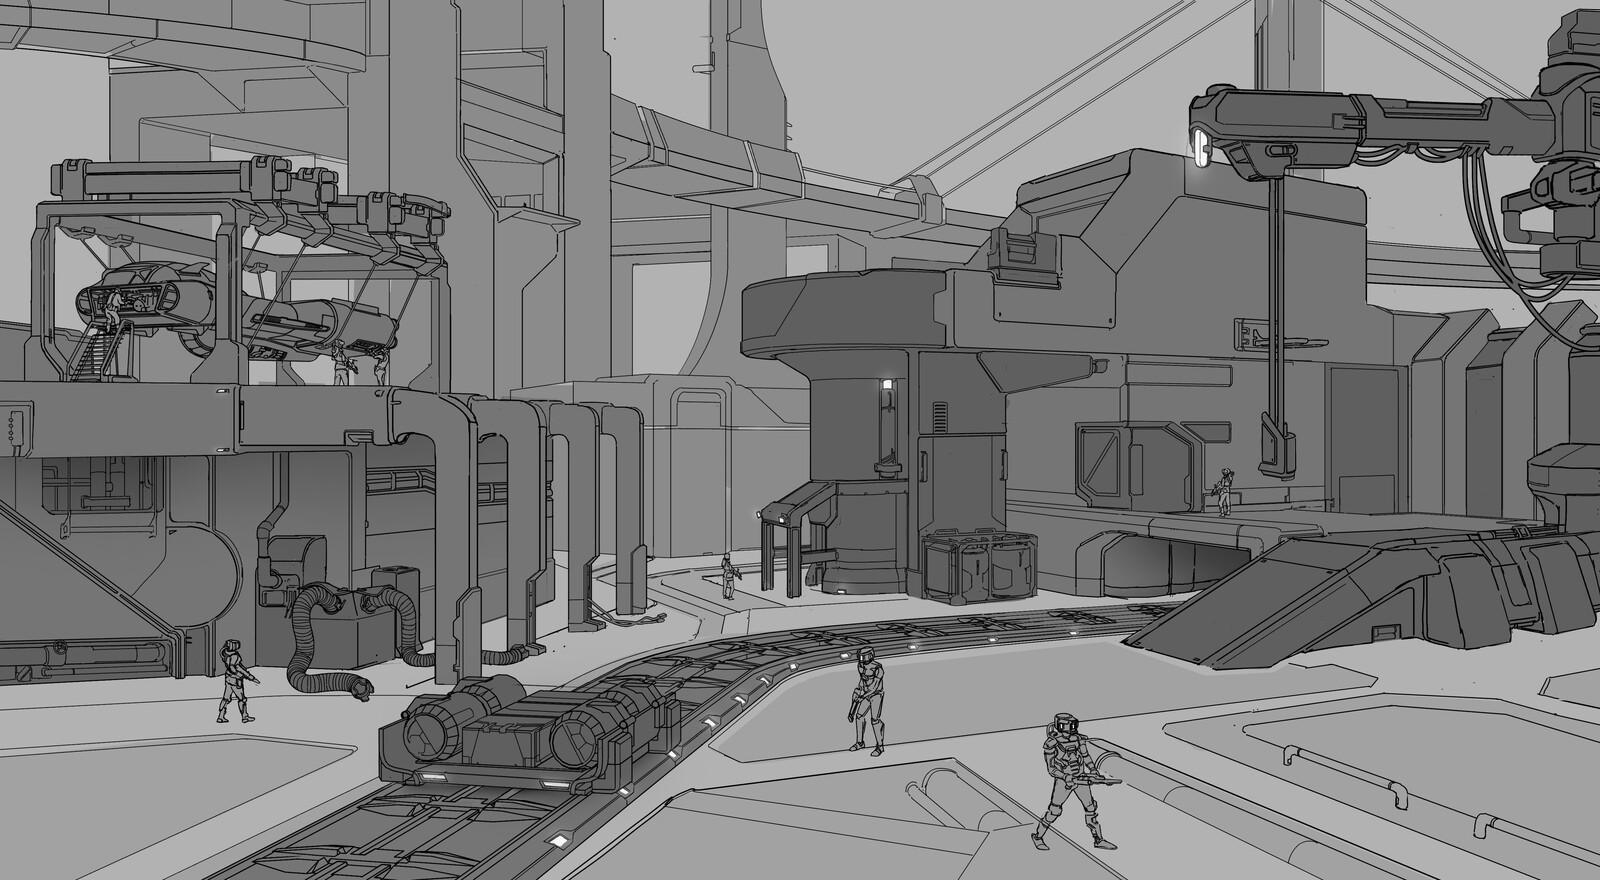 Sci-fi courtyard